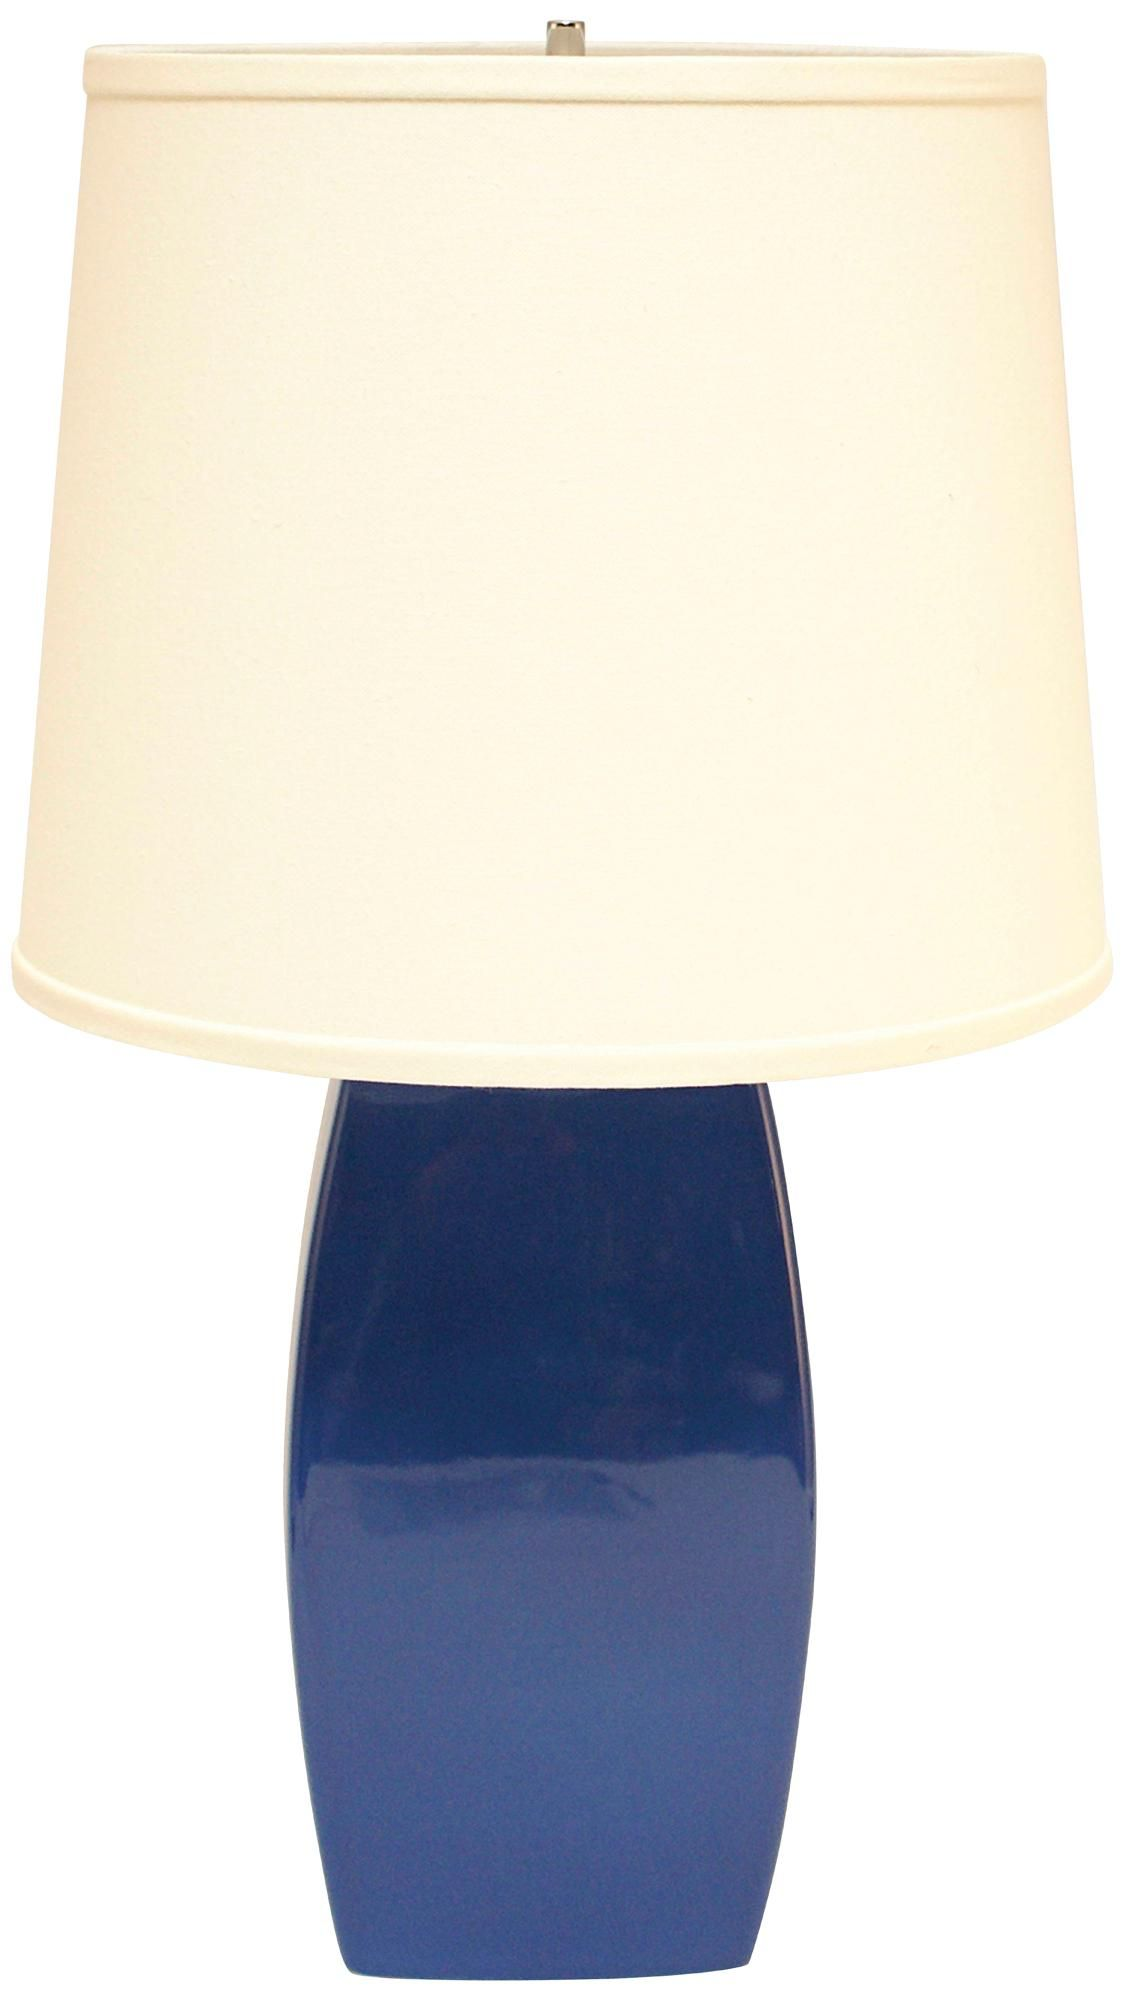 Haeger Potteries Blue Ceramic Soft Rectangle Table Lamp P1906 Lamps Plus Table Lamp Lamp Ceramic Lamp Base